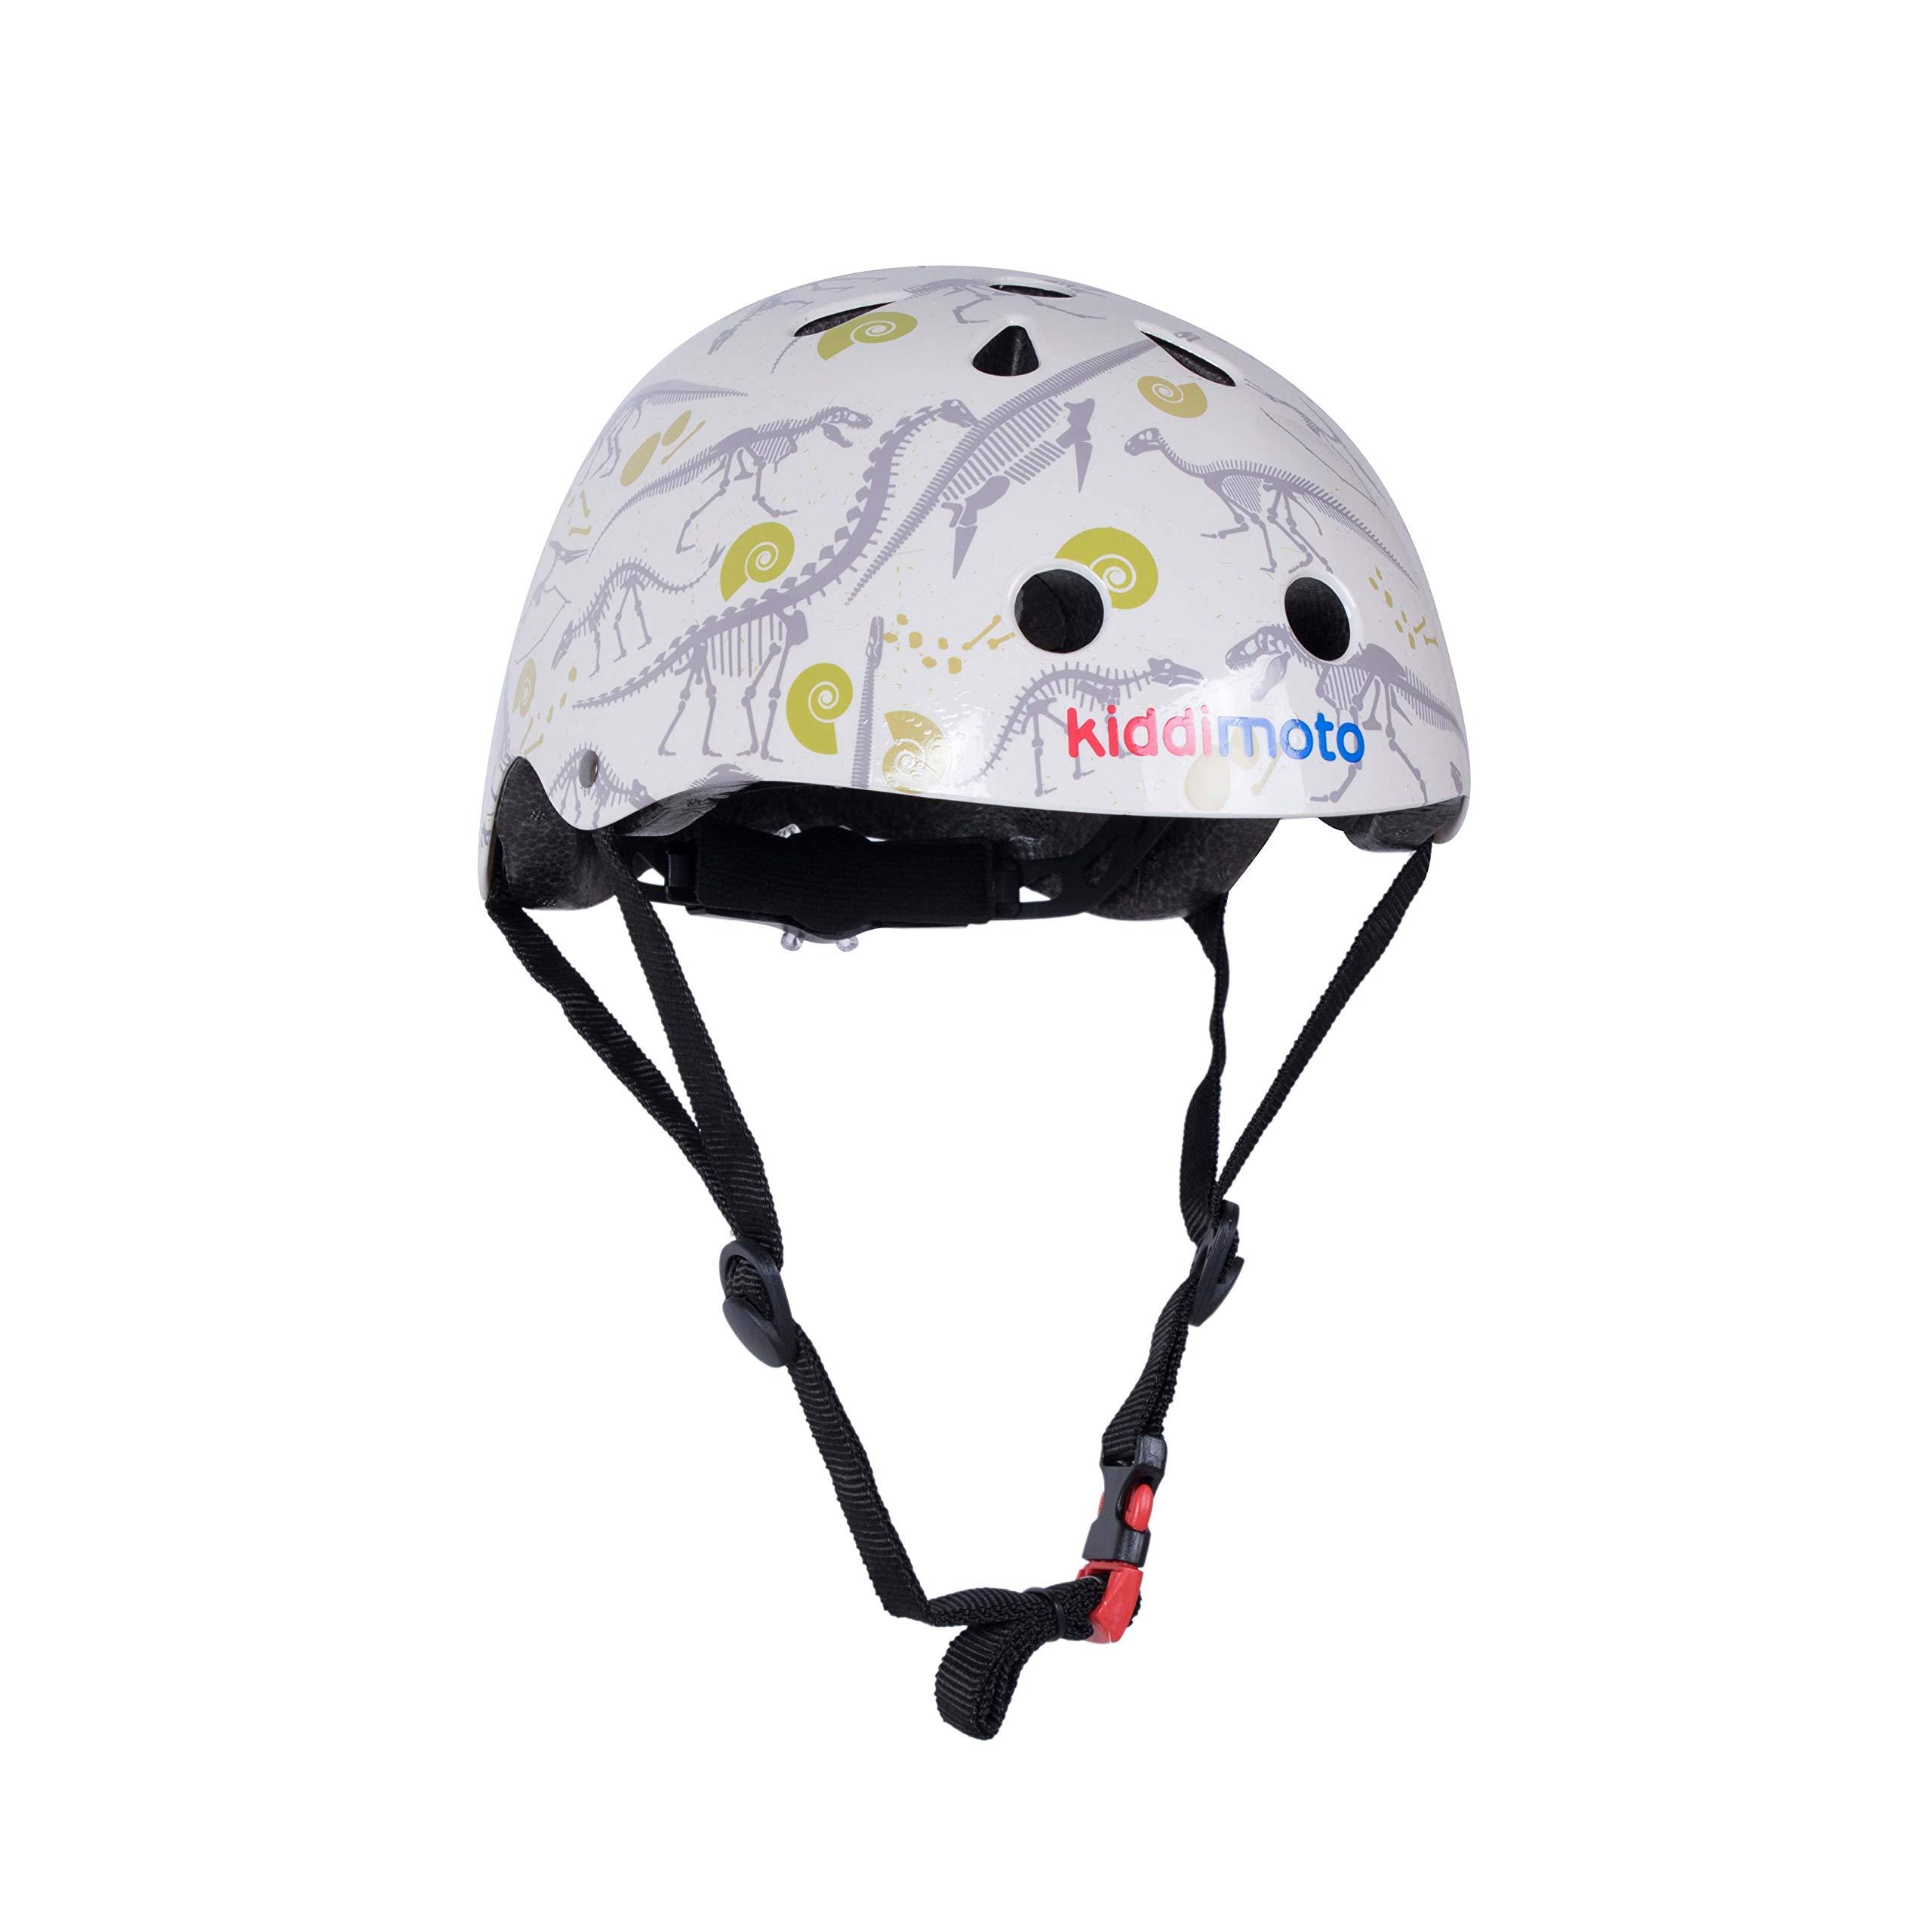 Kiddimoto Kids Patterned Helmet (Fossil, Small)